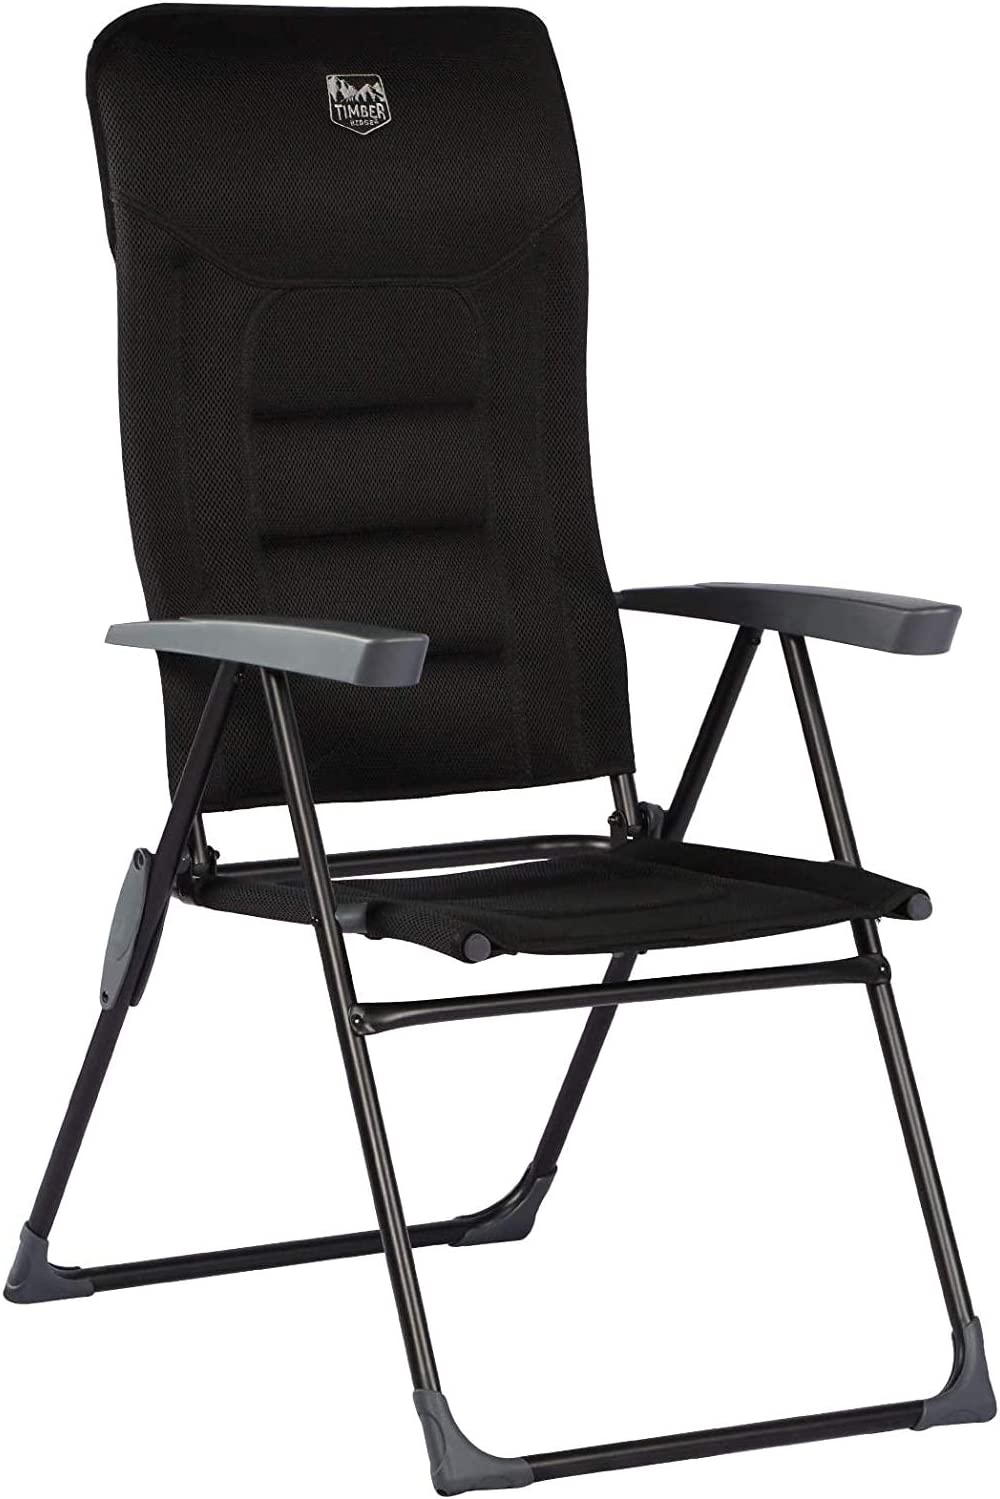 TIMBER RIDGE Padded Reclining Folding Camping Chair High Back Lightweight Aluminum 7-Position Adjustable Backrest Black